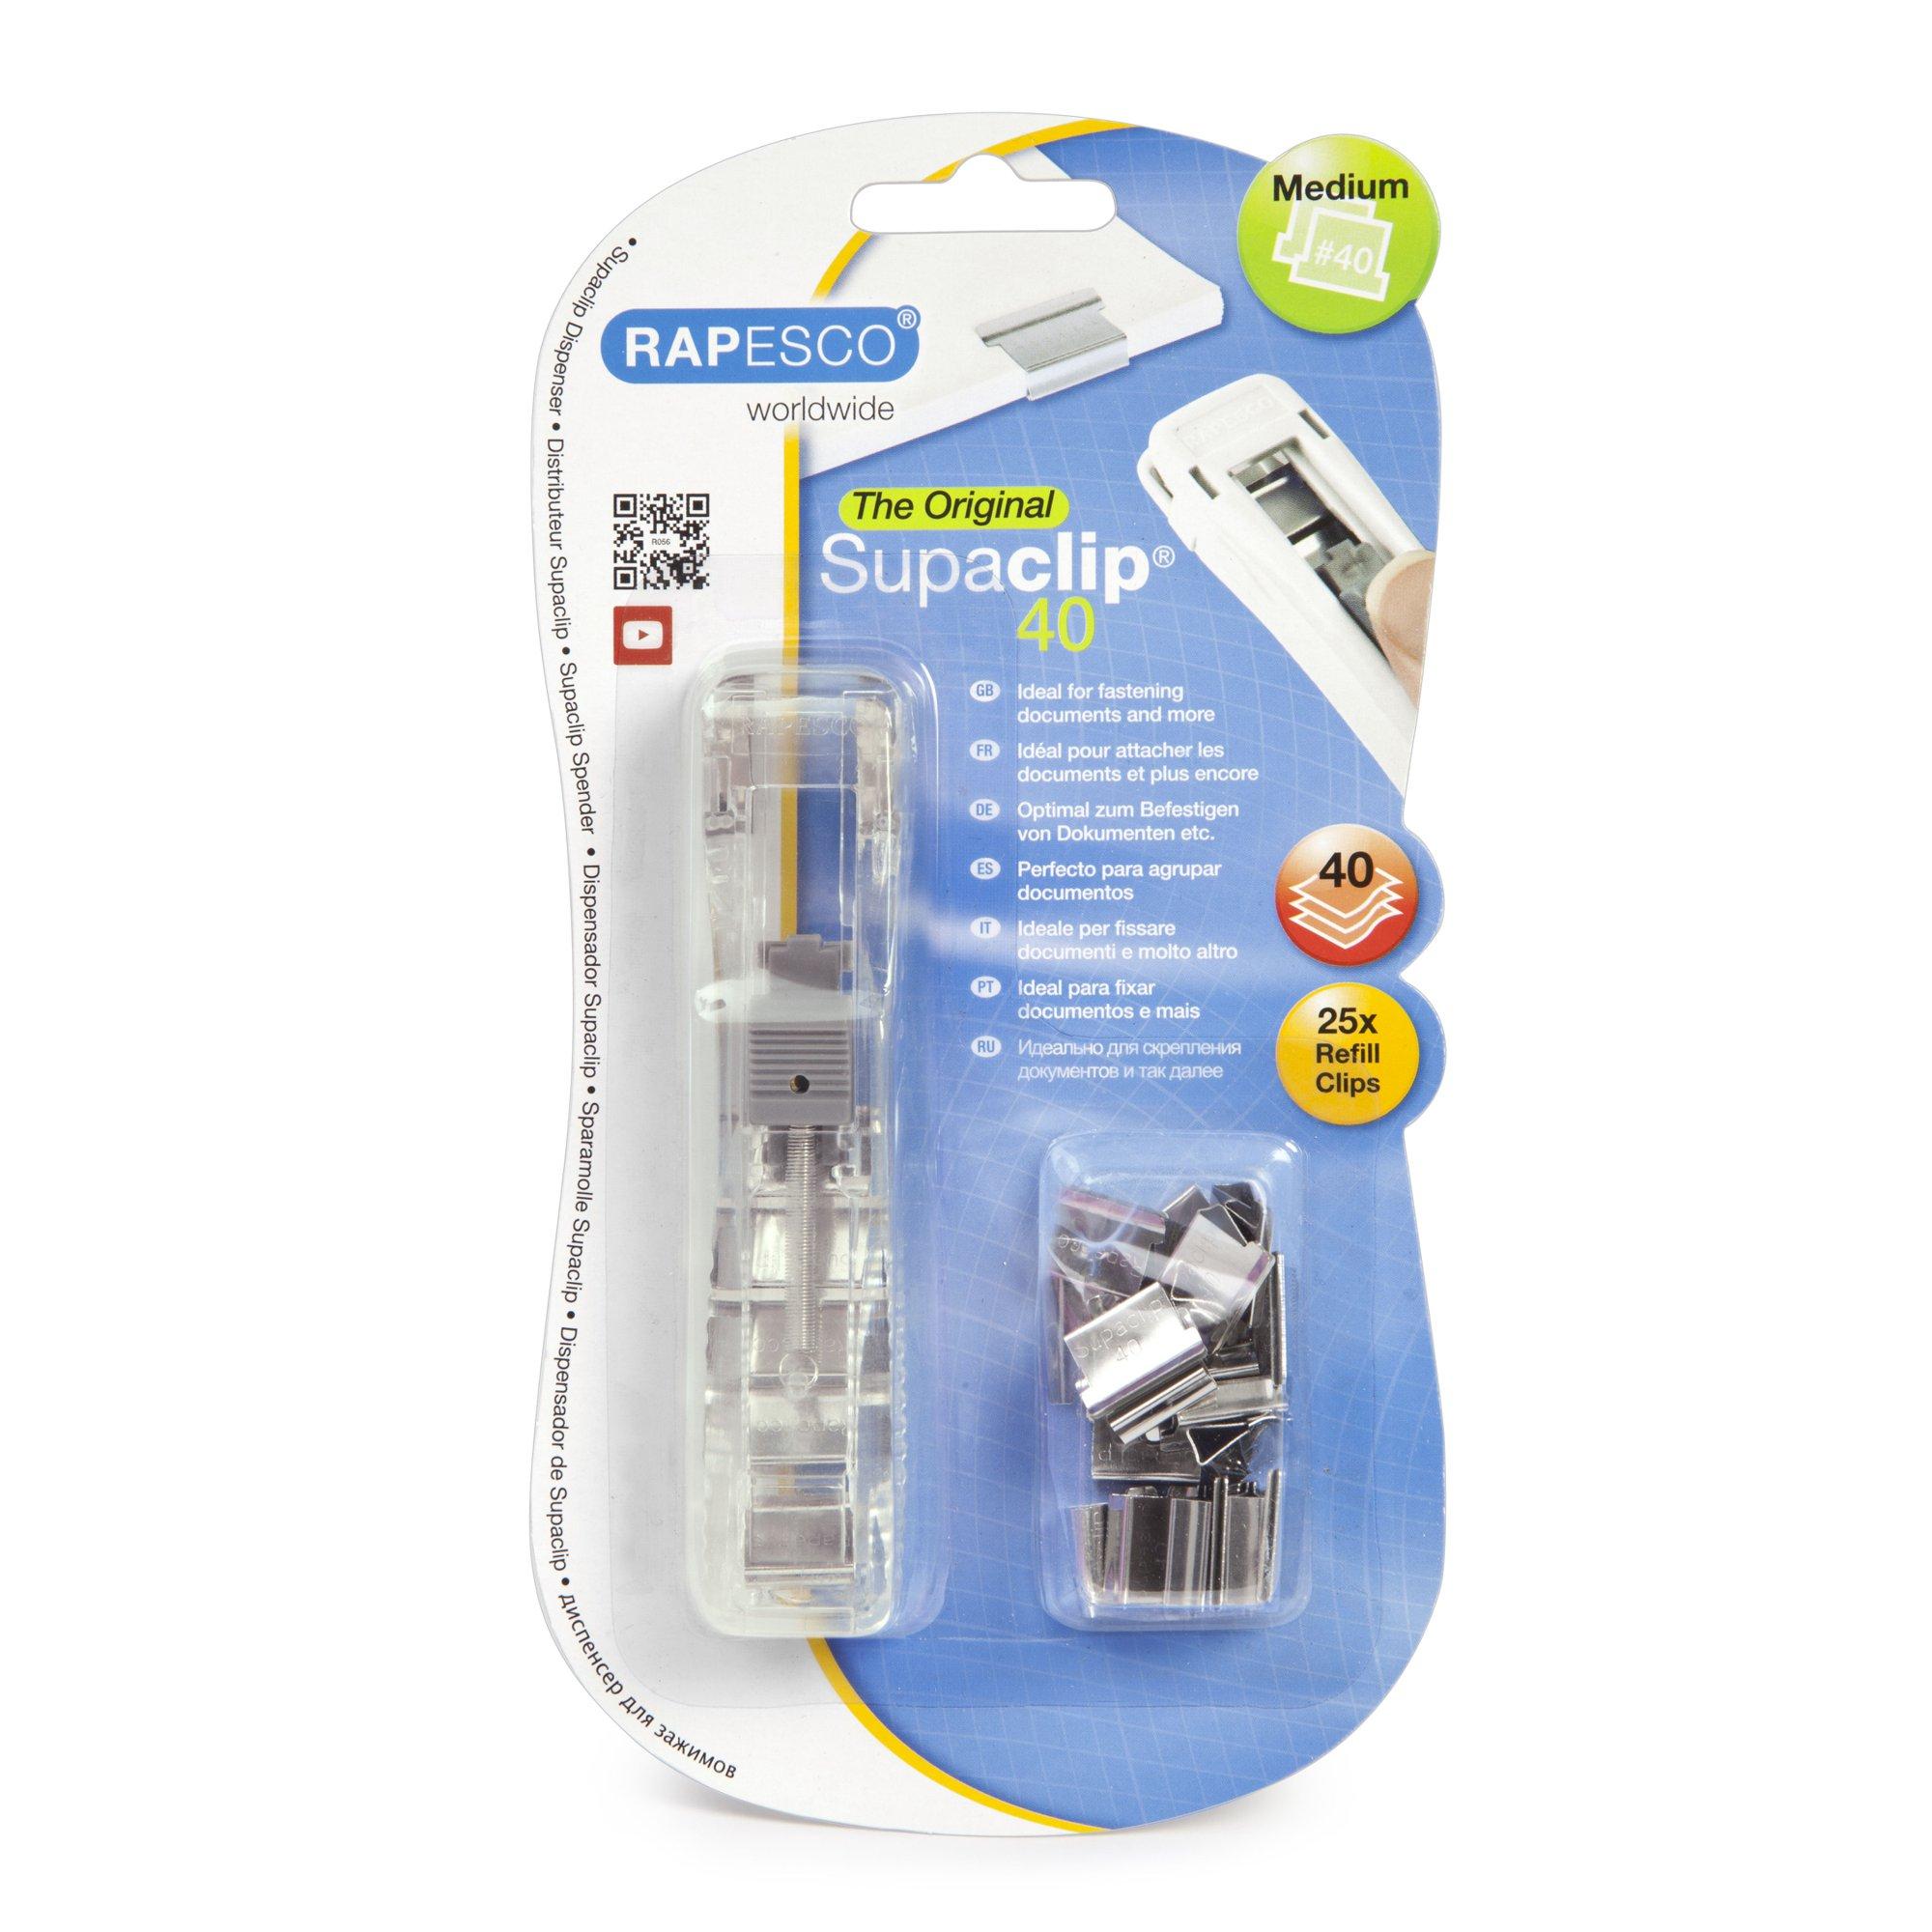 Image for Rapesco Supaclip 40 Dispenser RC4025SS